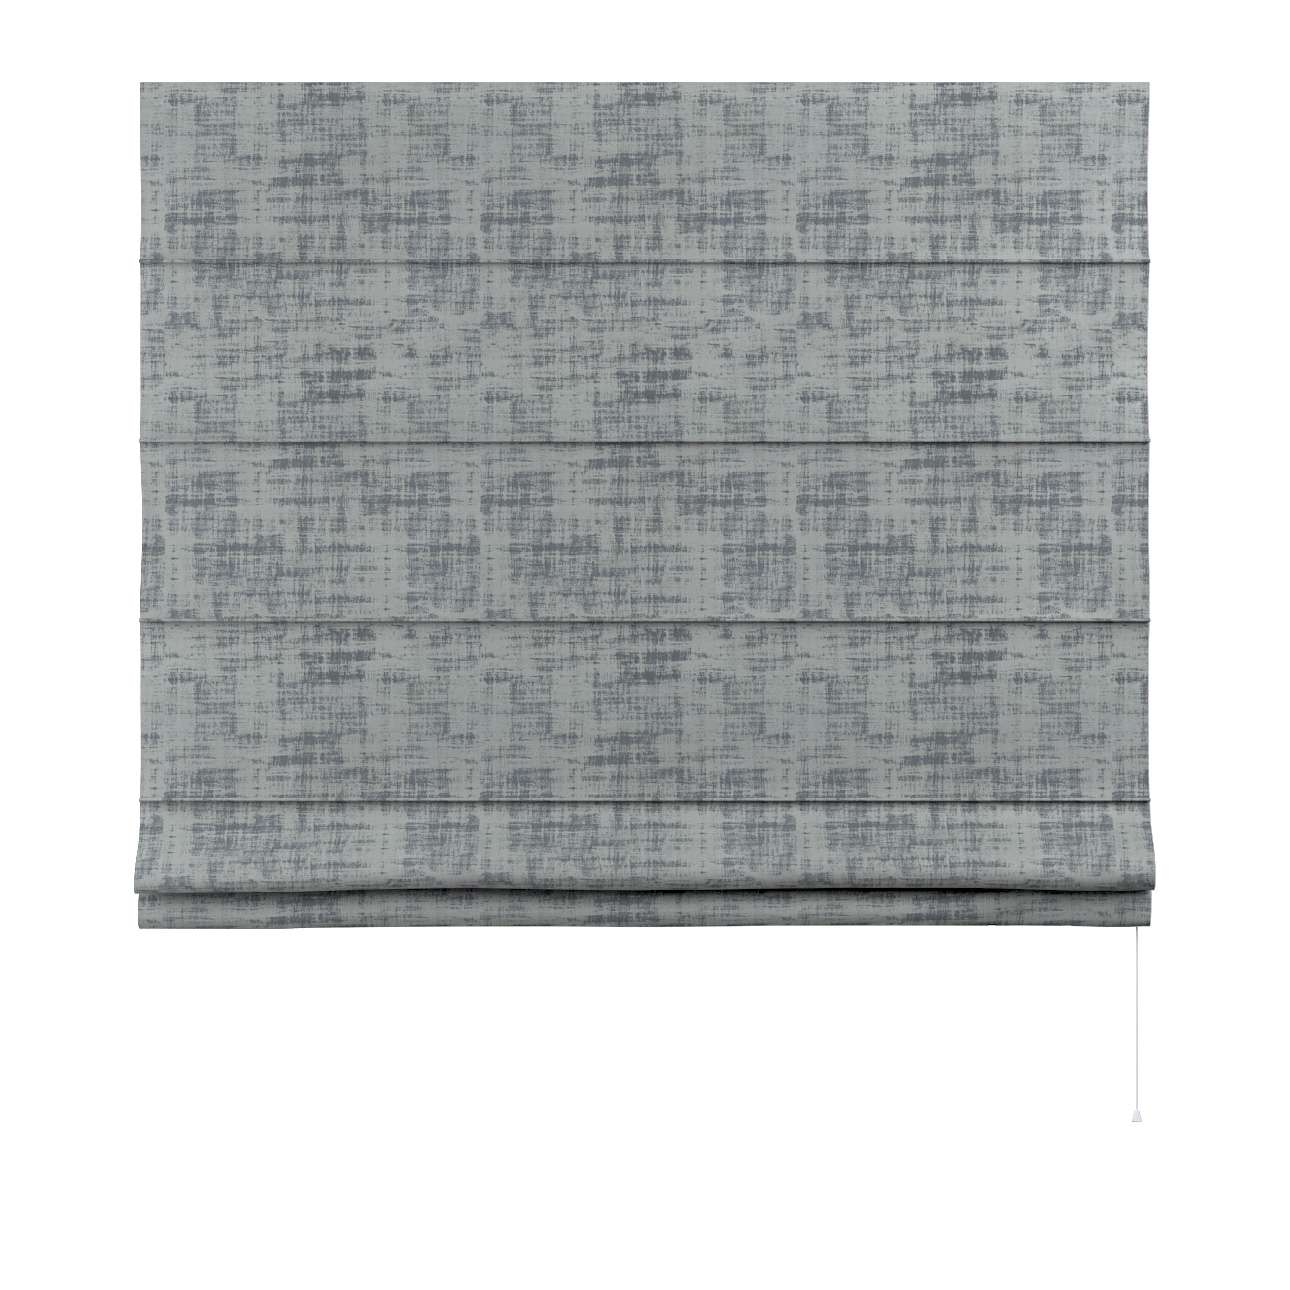 Rímska roleta Capri V kolekcii Velvet, tkanina: 704-32